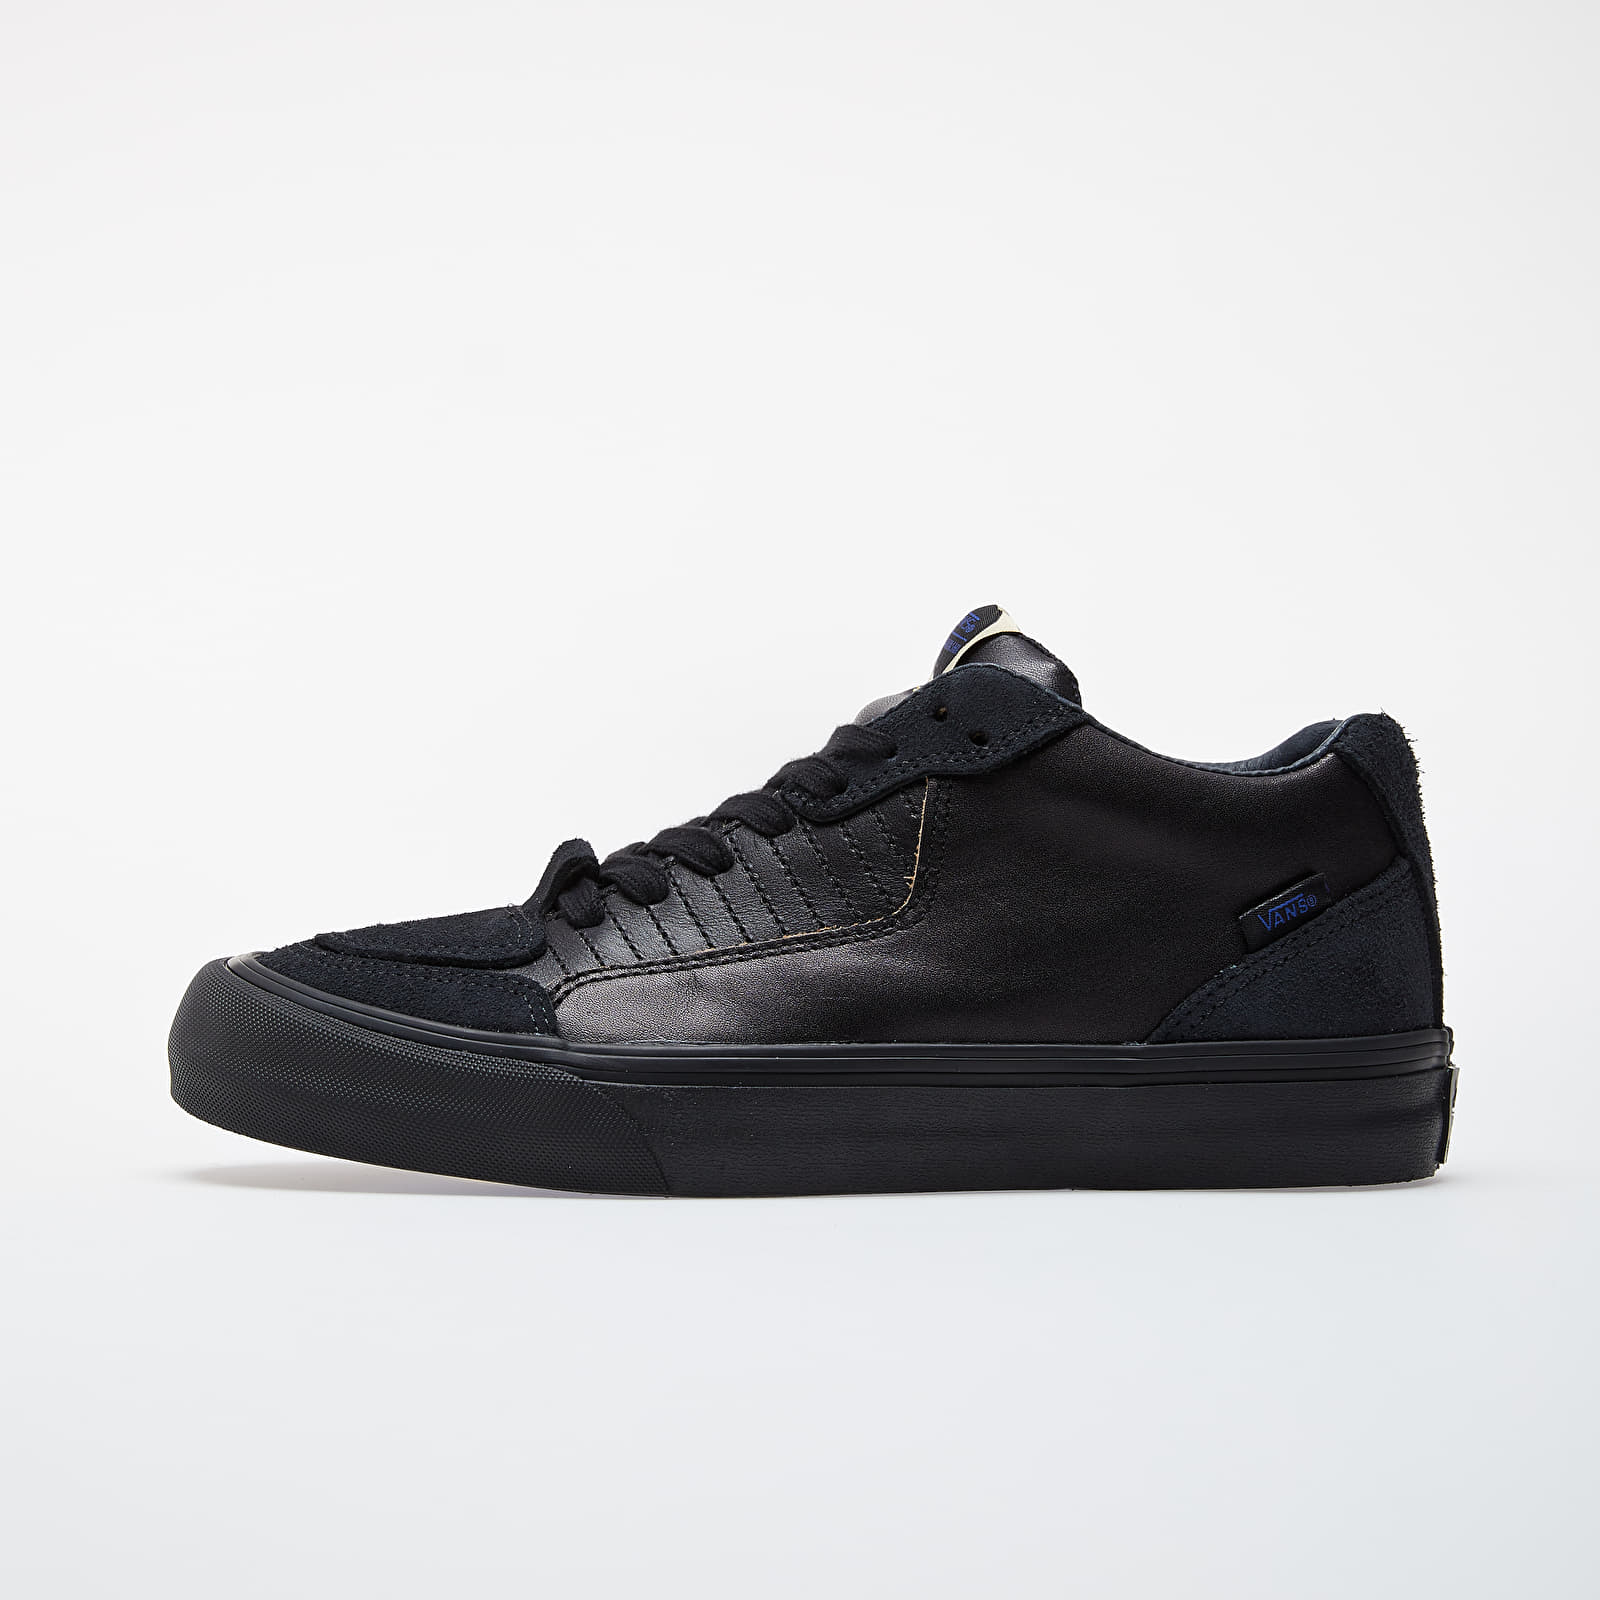 Men's shoes Vans x Taka Hayashi Style 98 LX (Leather/ Hairy Suede) Black